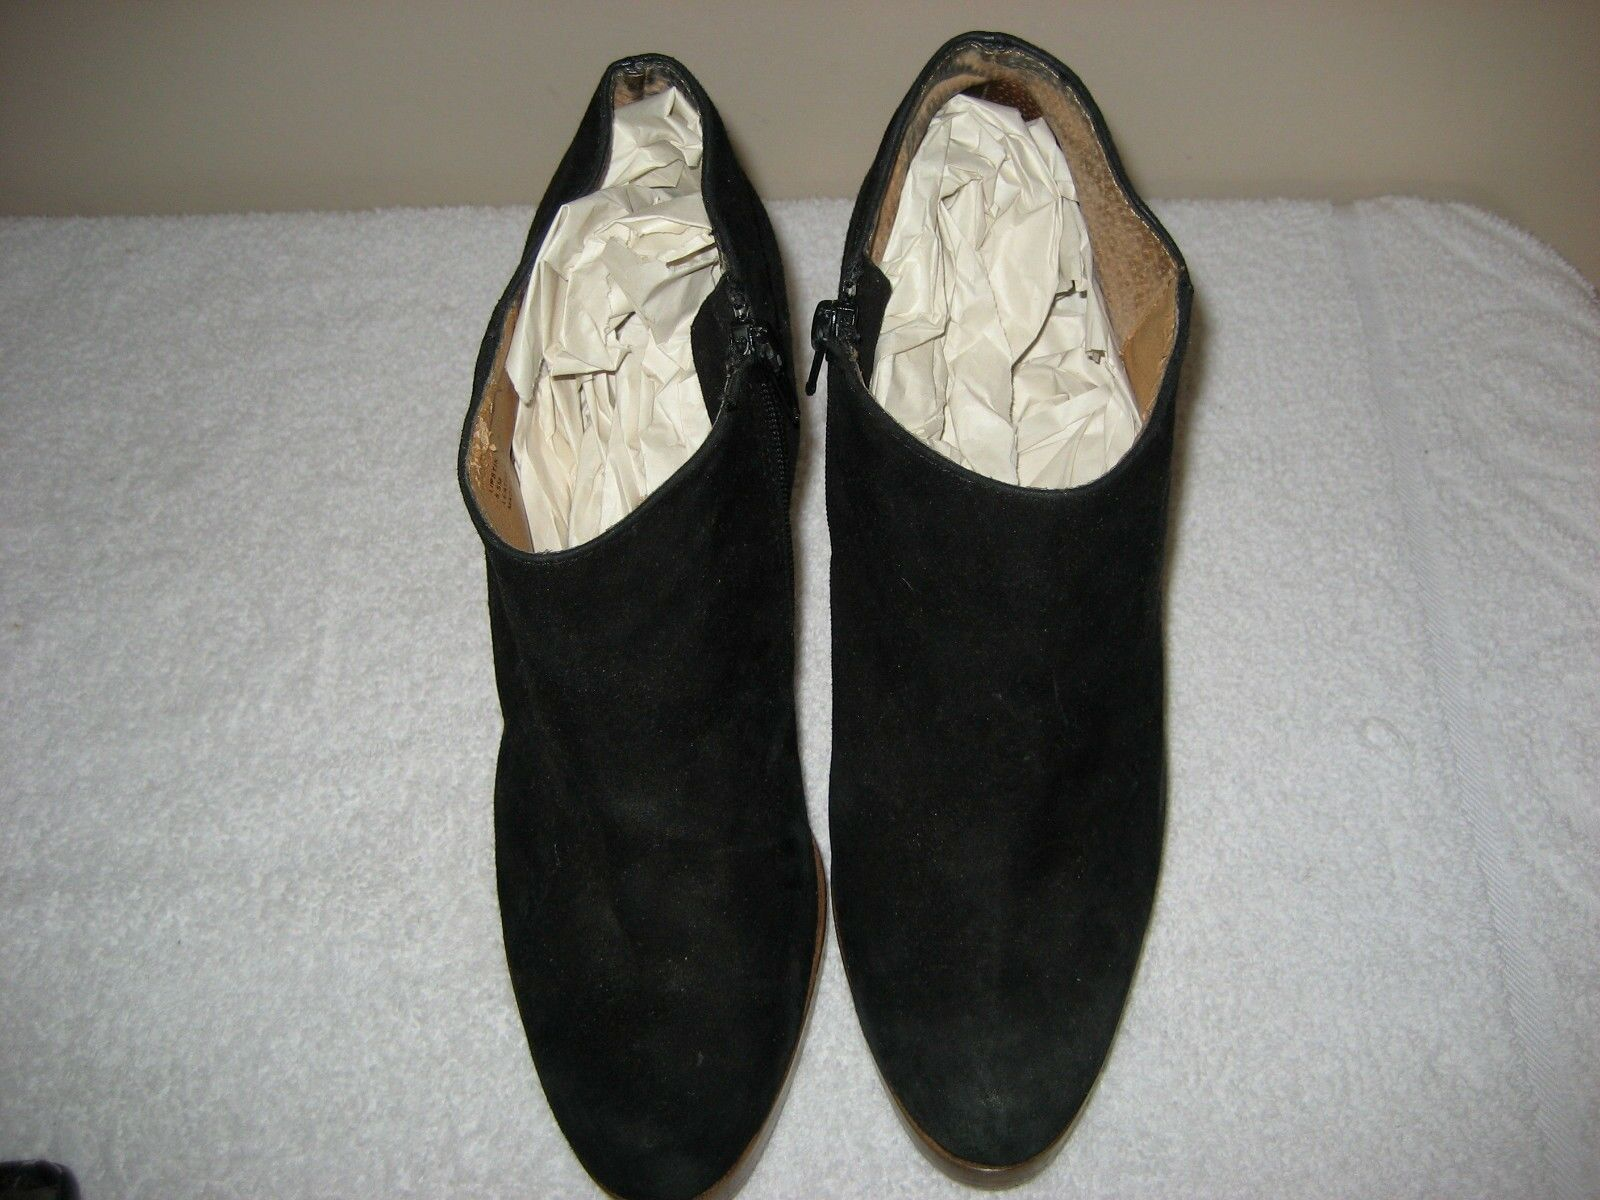 Steve Madden lipstik 8 1 2 M Negro Negro Negro Gamuza botas al Tobillo Zapatos De Tacones Altos Botines  Sin impuestos